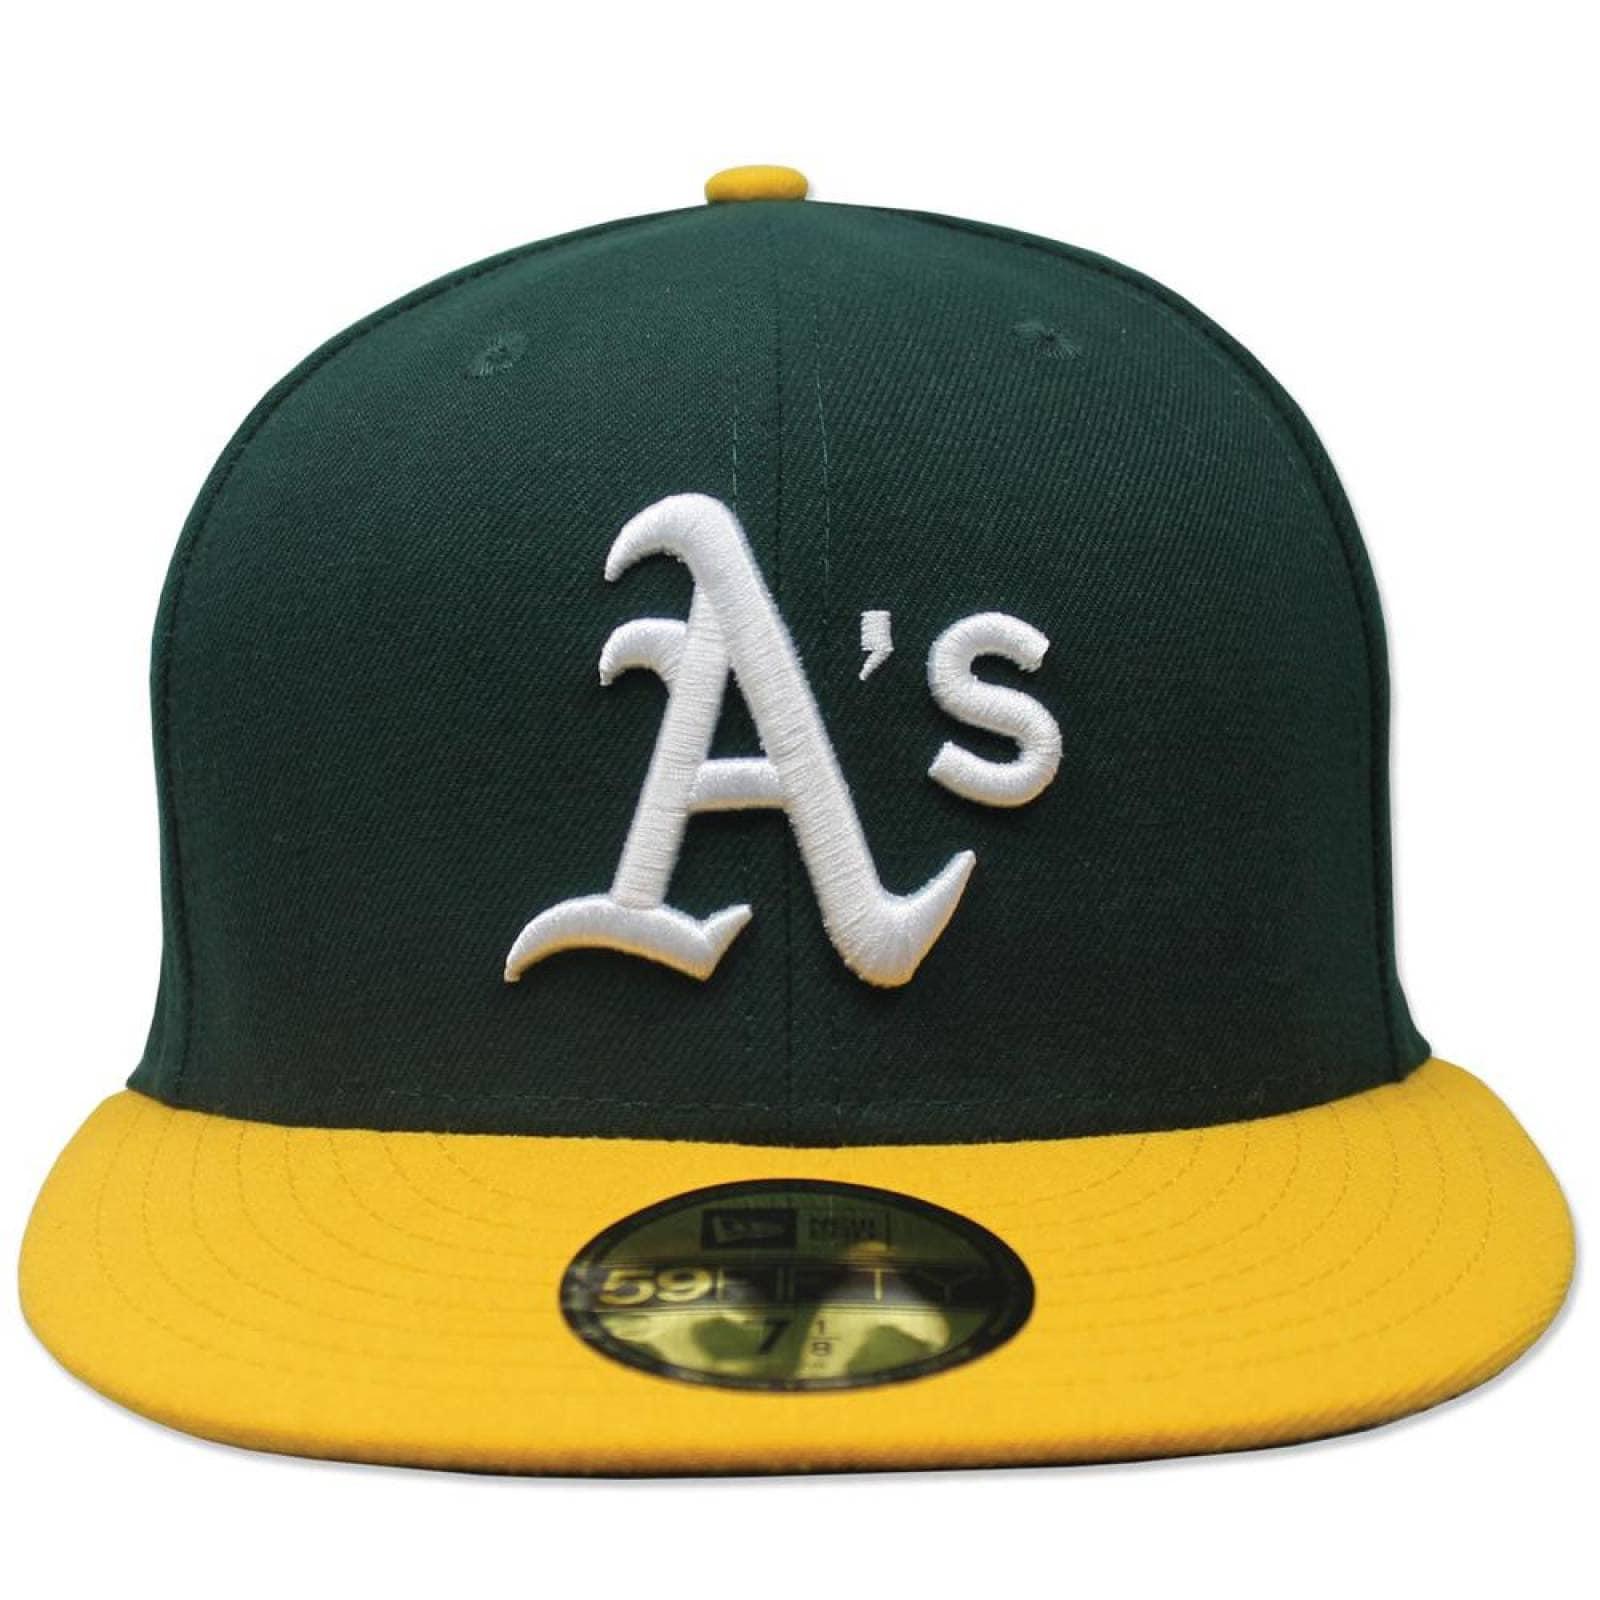 Gorra New Era 5950 Oakland Athletics Home Ac Perf VerdeAmarillo